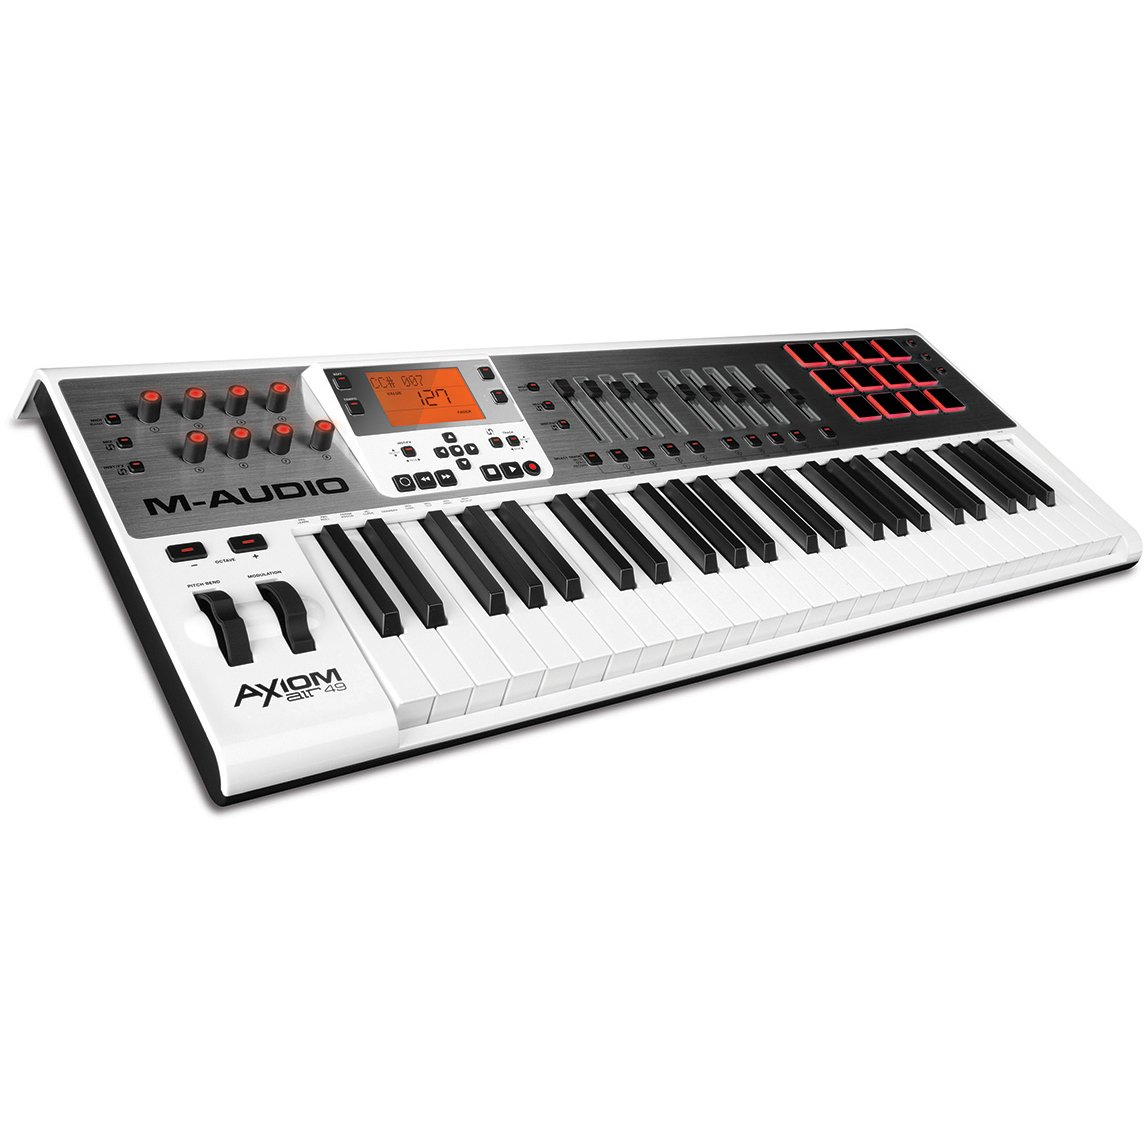 M-Audio USB - MIDIコントローラ Axiom AIR 49 MA-CON-016 B00BQ6KSMW